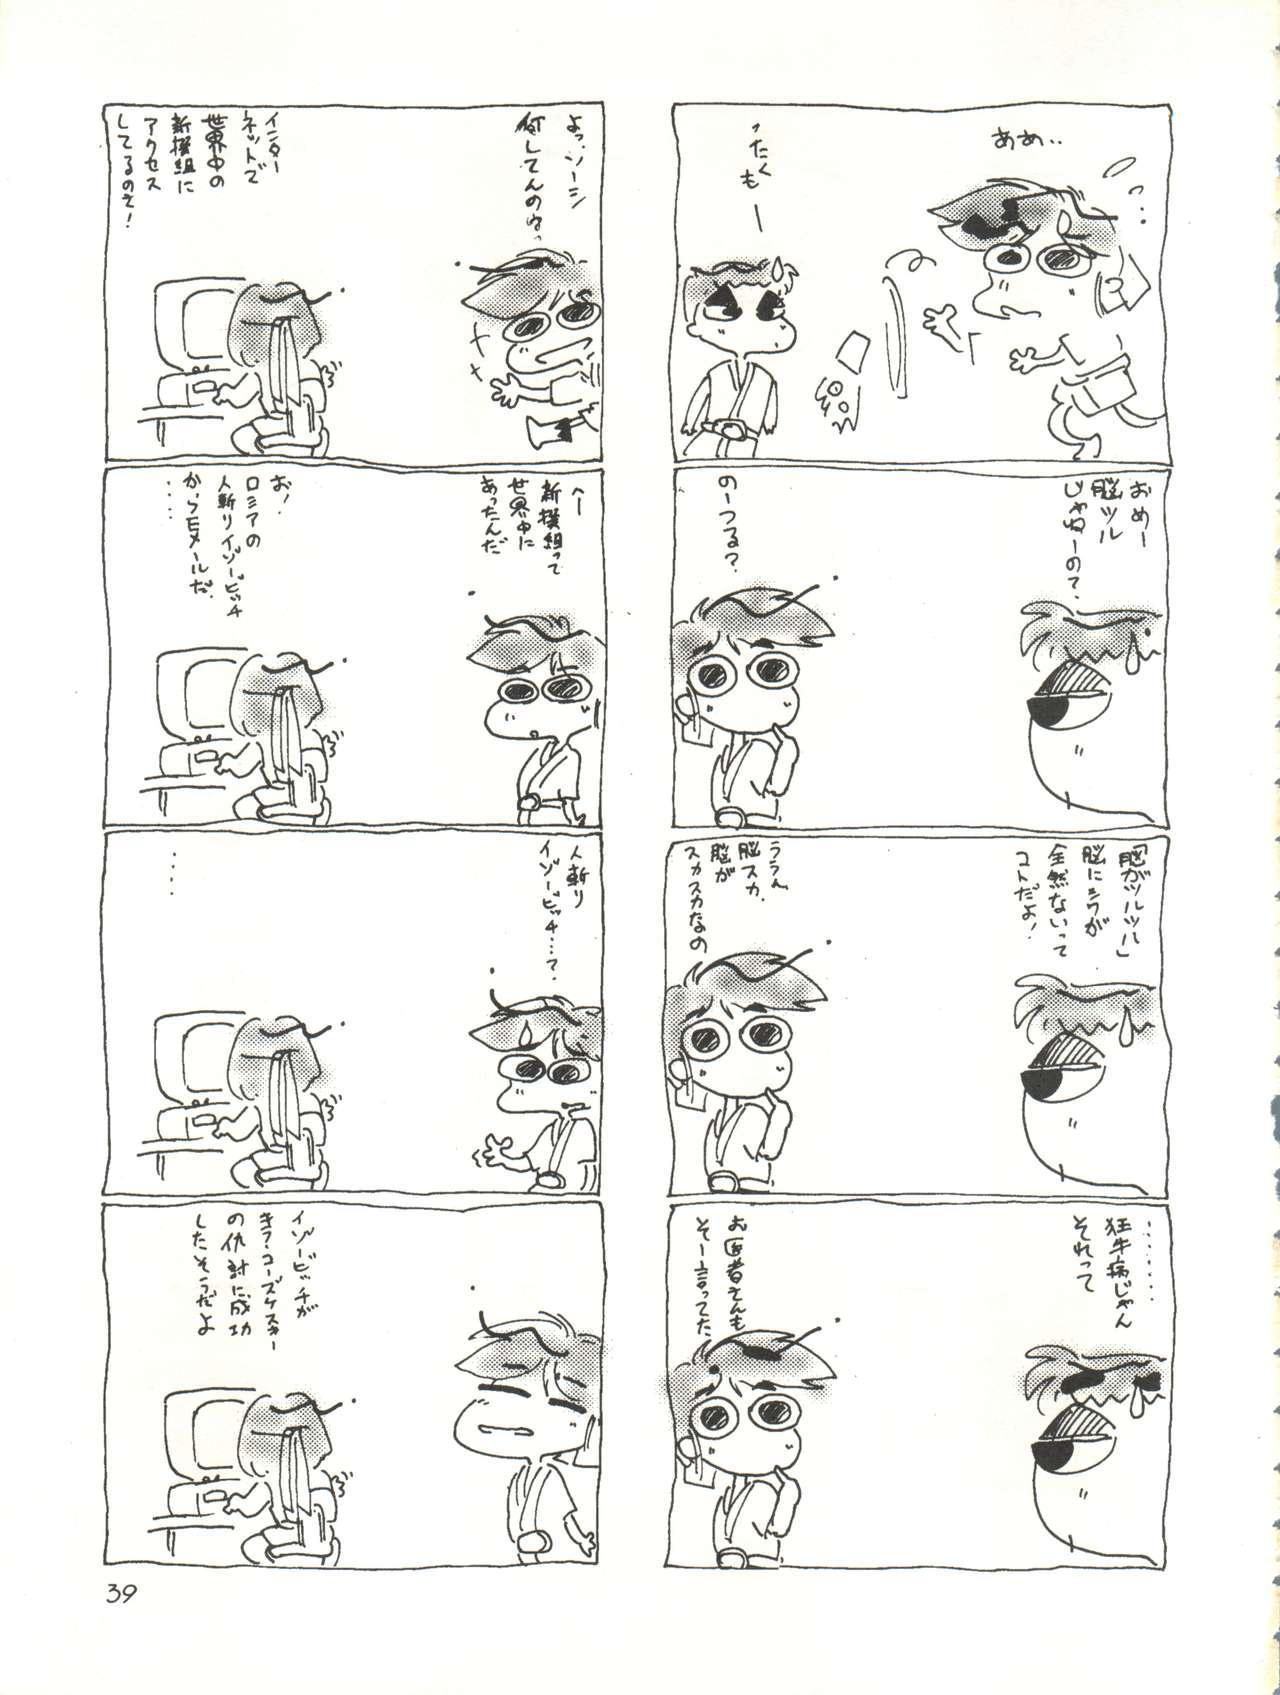 Kaiketsu Spats 38